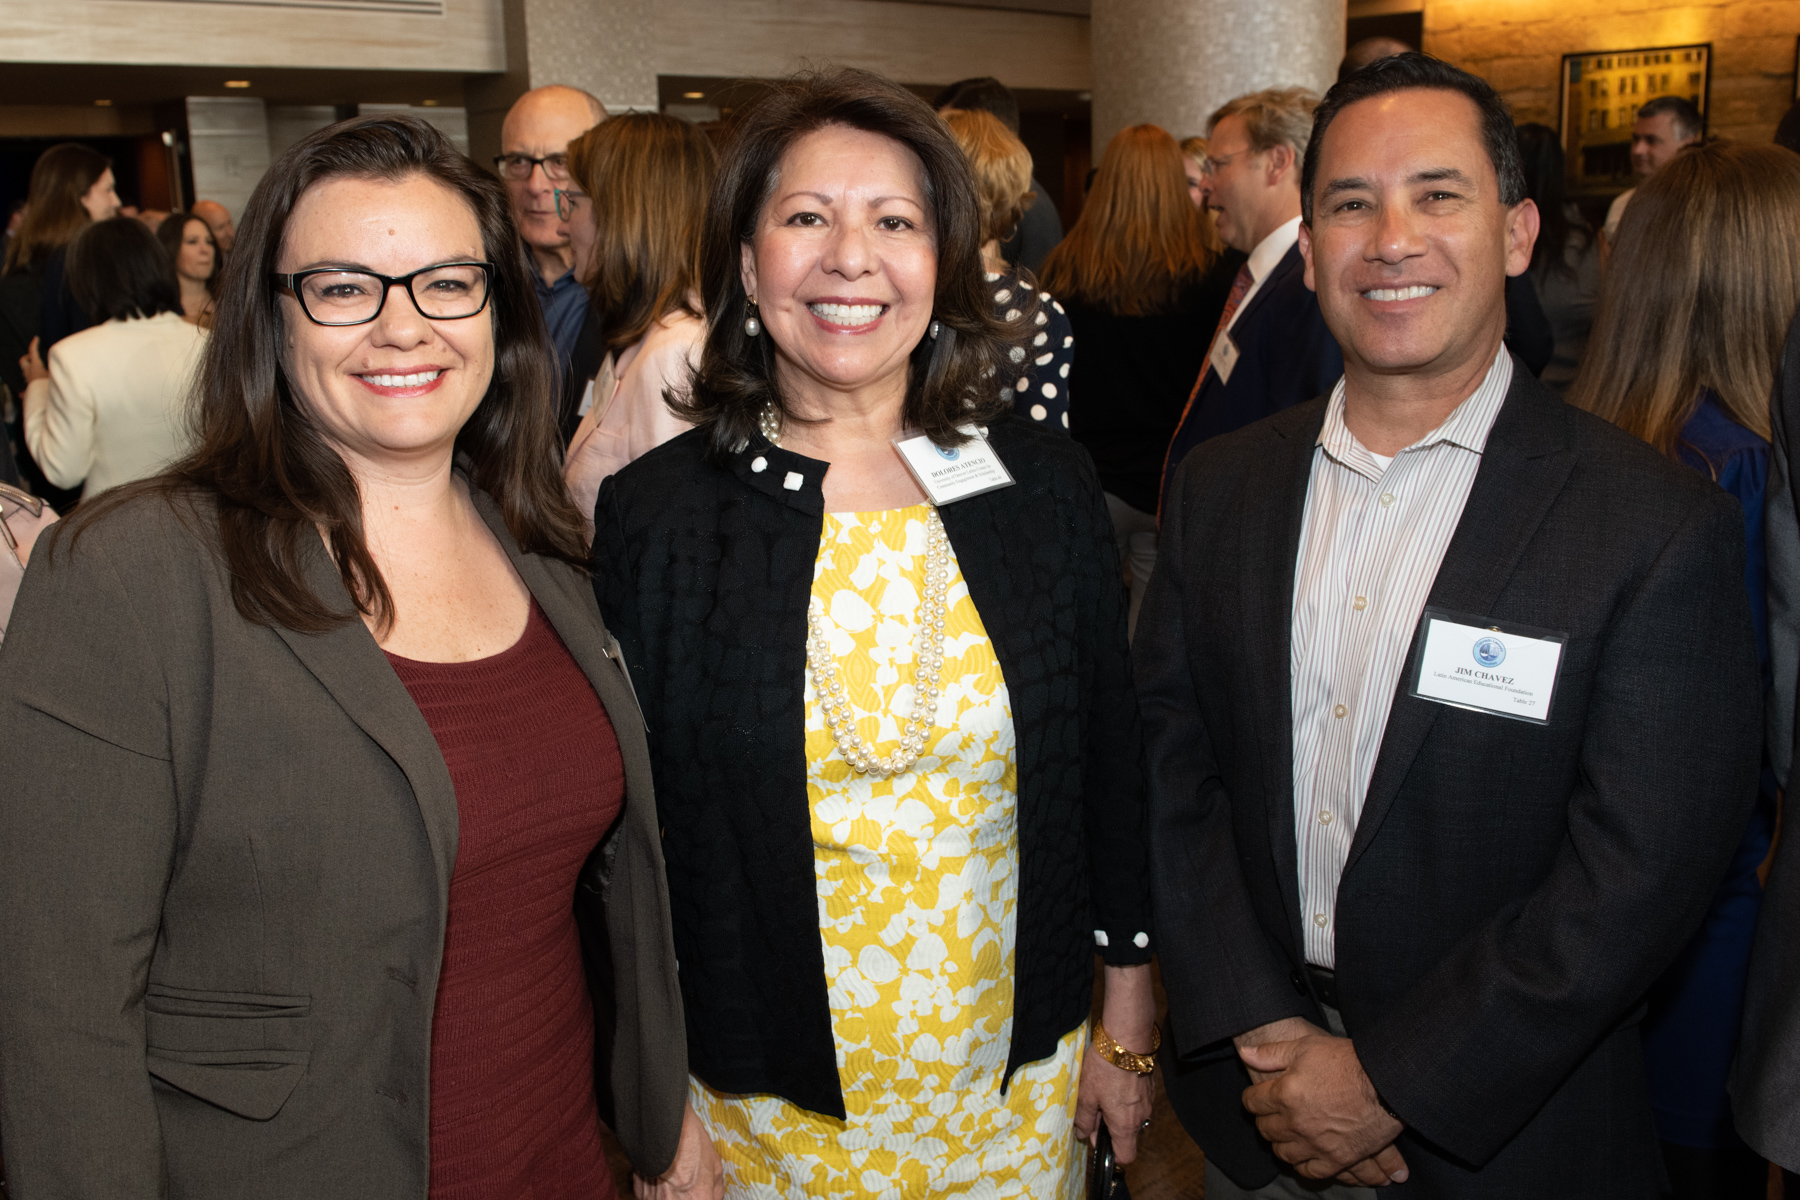 _DSC7191 Olivia Mendoza, Dolores Atencio & Jim Chavez (courtesy of Hartmannphoto).jpg